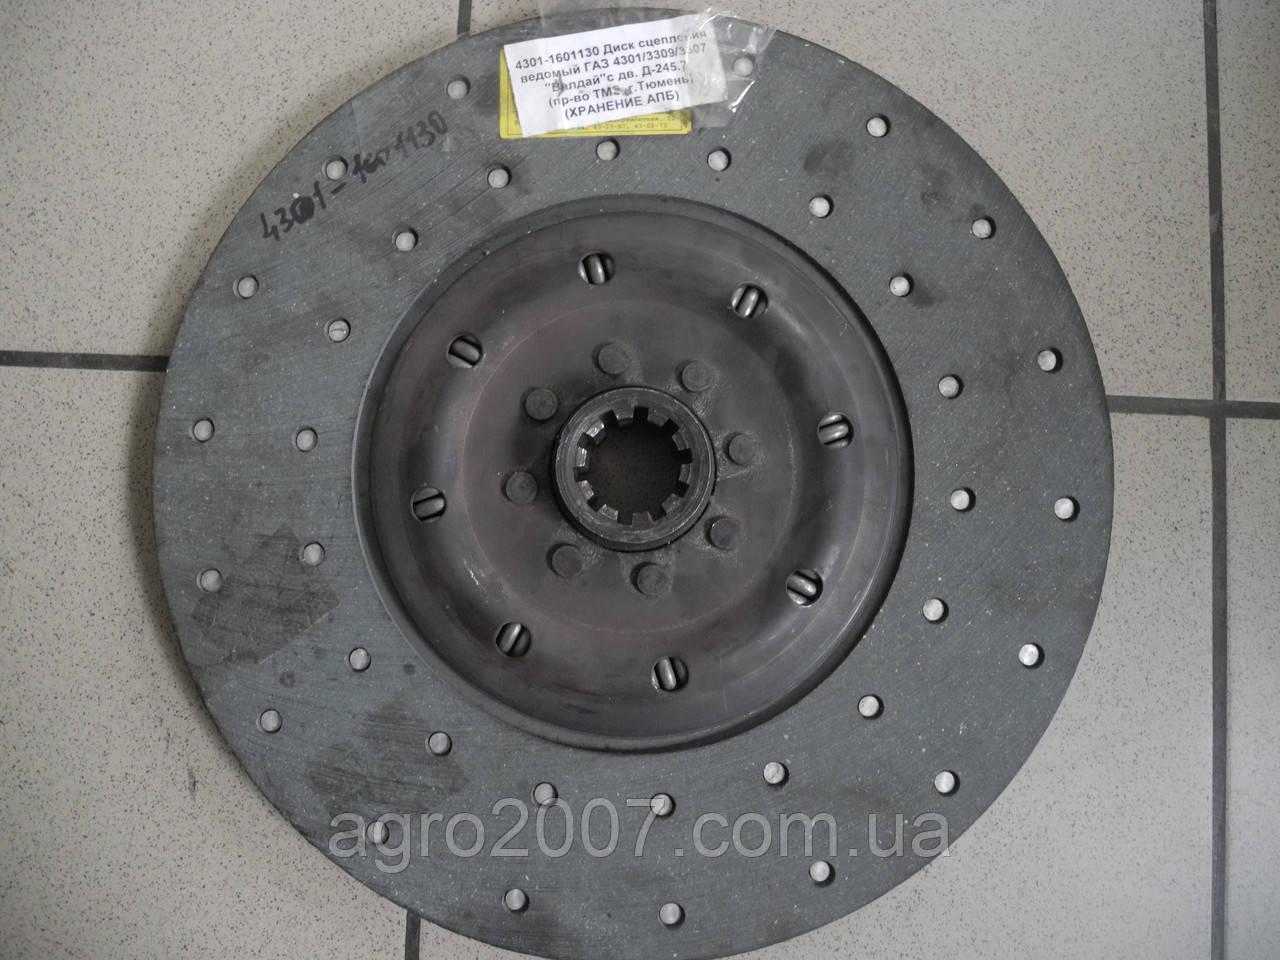 Диск сцепления ГАЗ 4301 (пр-во ТМЗ) 4301-1601130